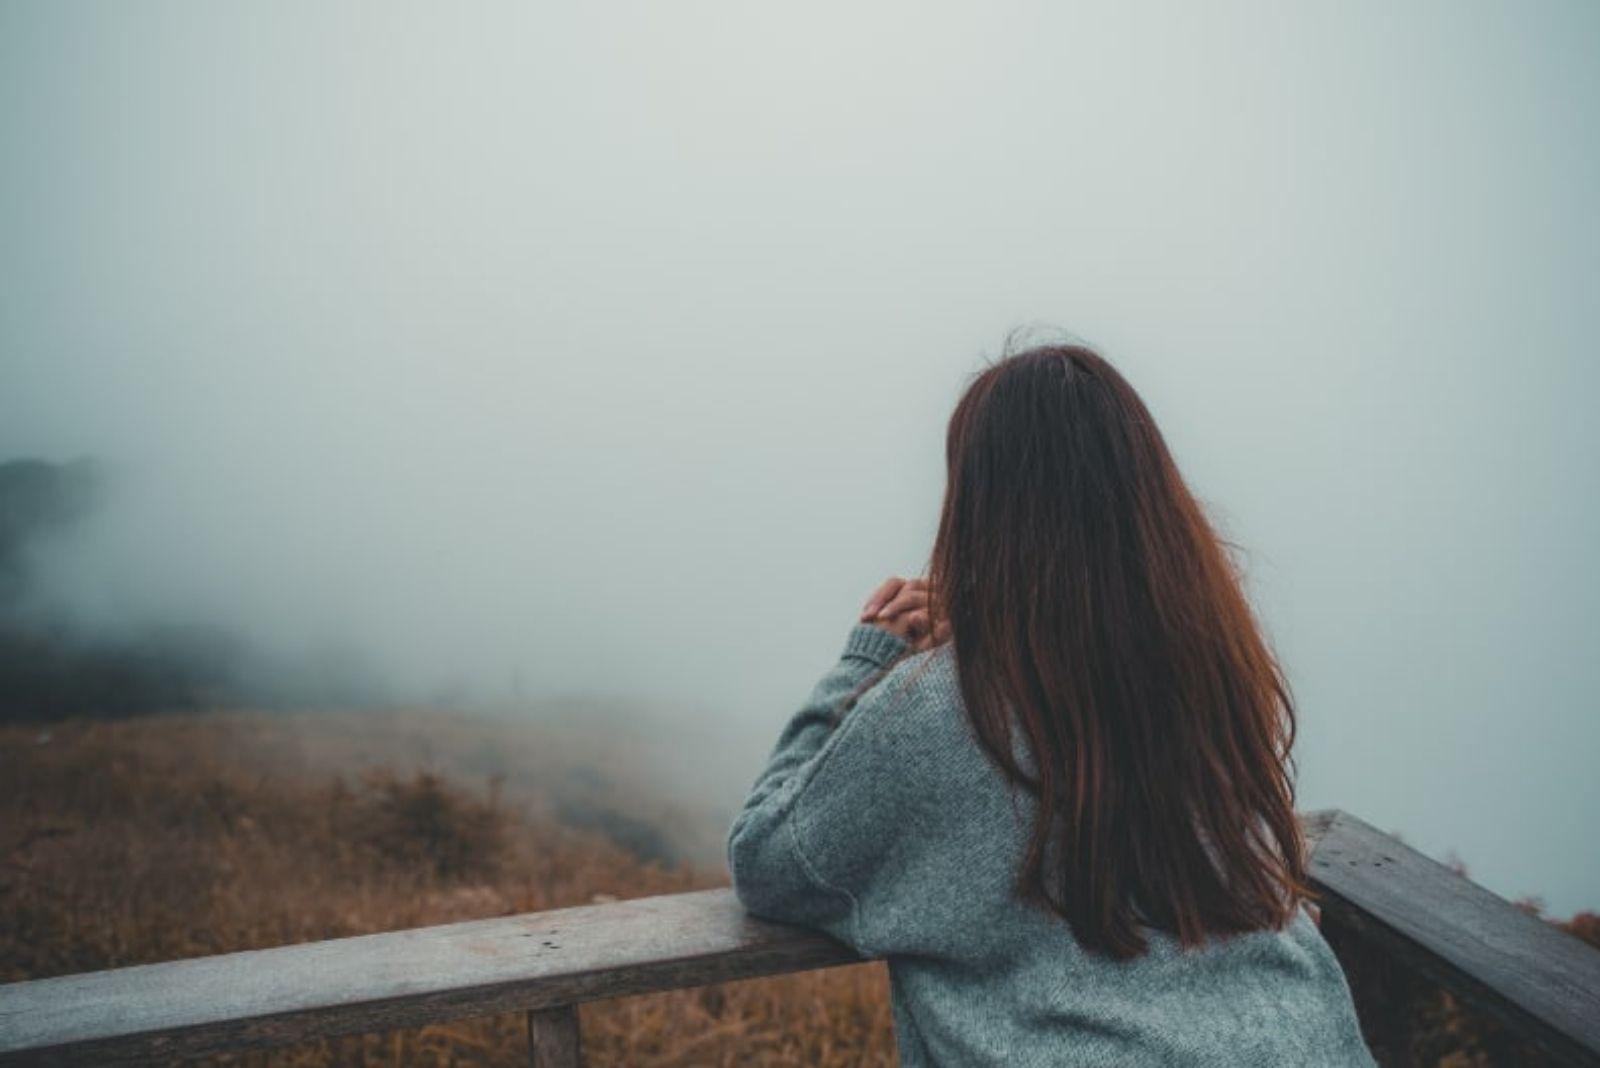 pensive sad woman looking away - foggy weather